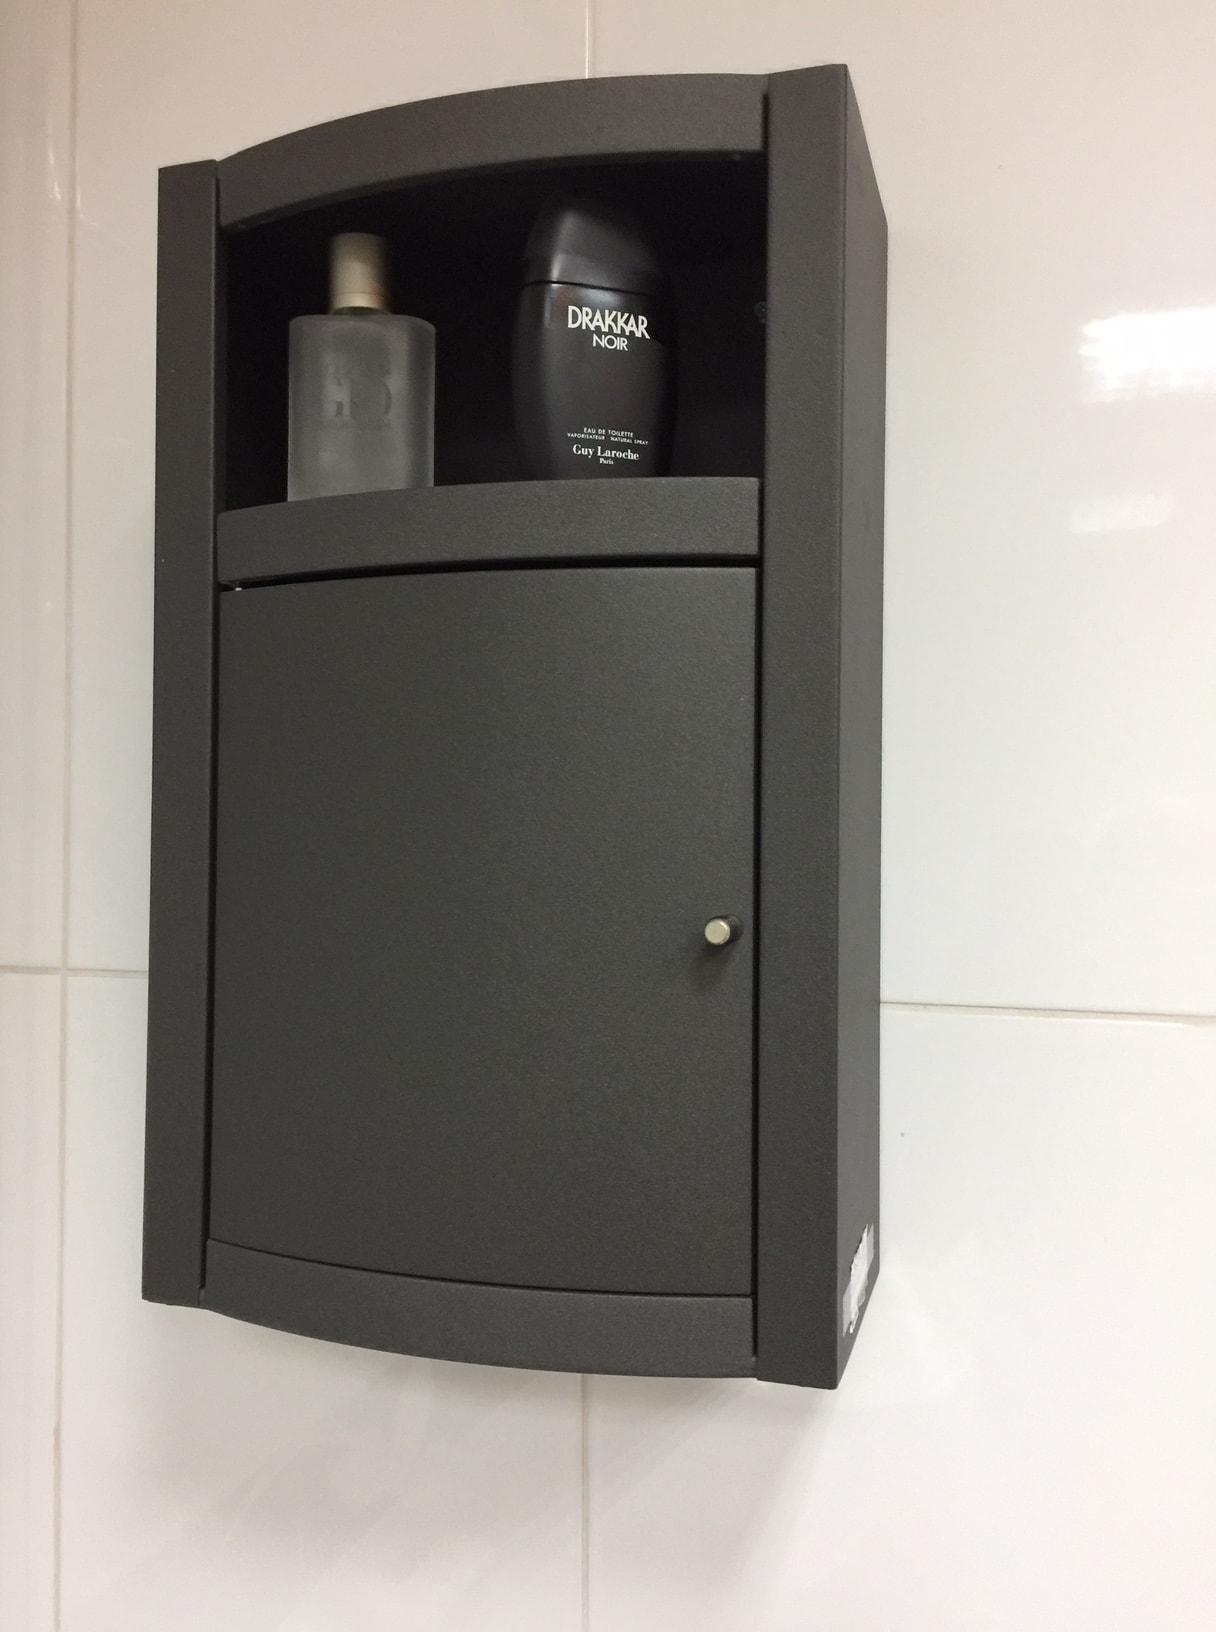 Konzolni ormarić crni namestaj kupatila online